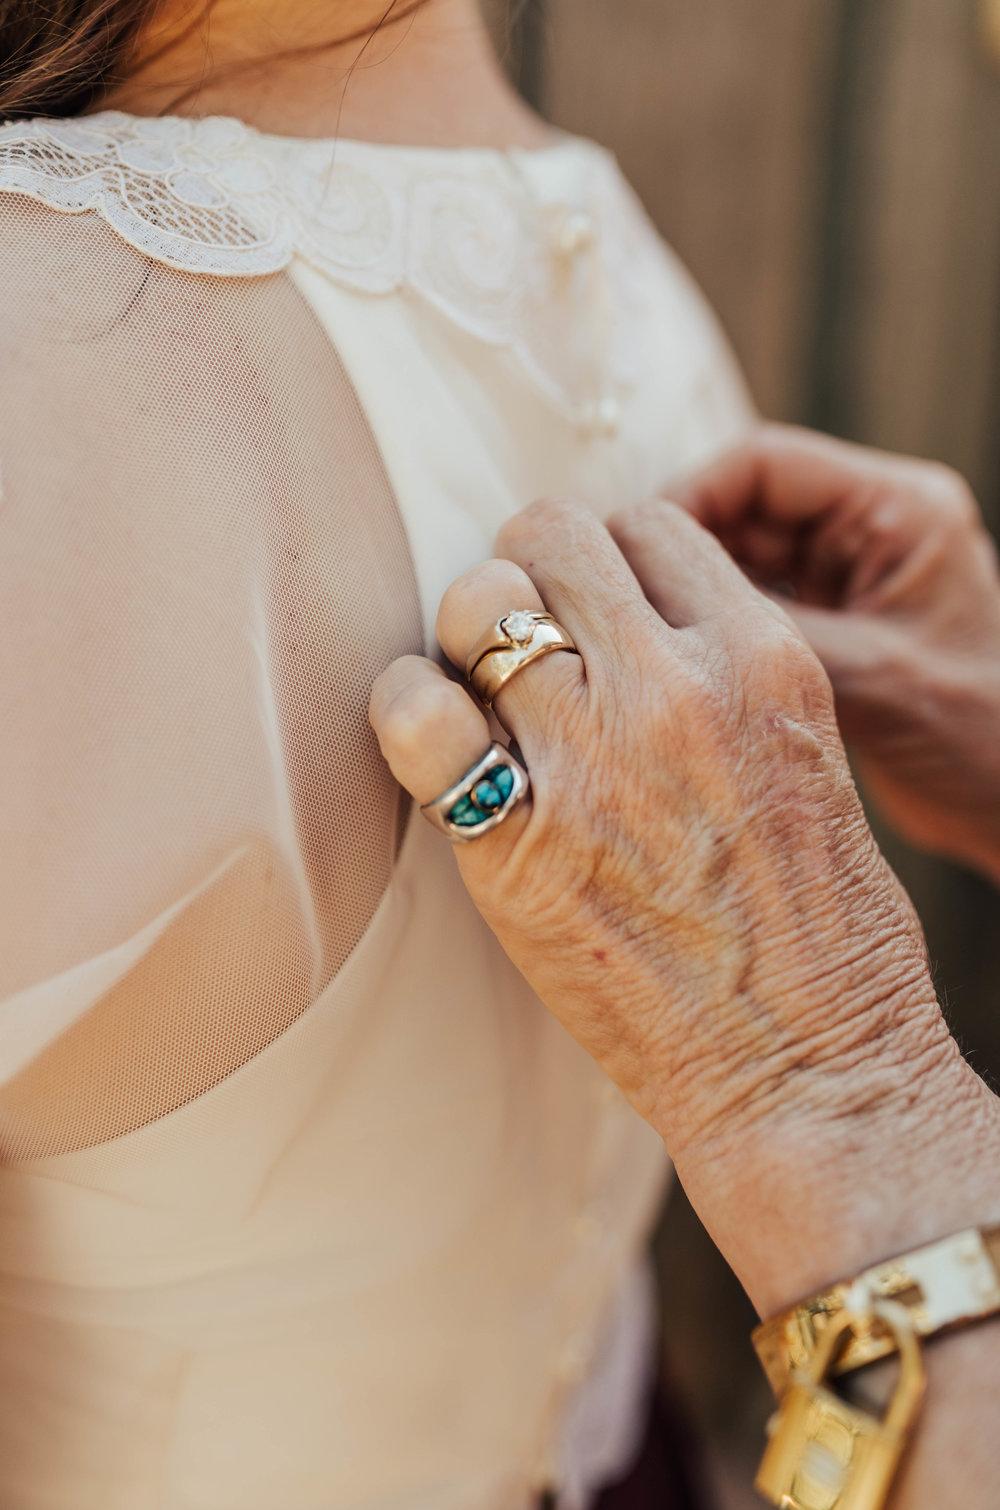 olivia and joel 5.5.18 wedding dayDSC_4088.jpg